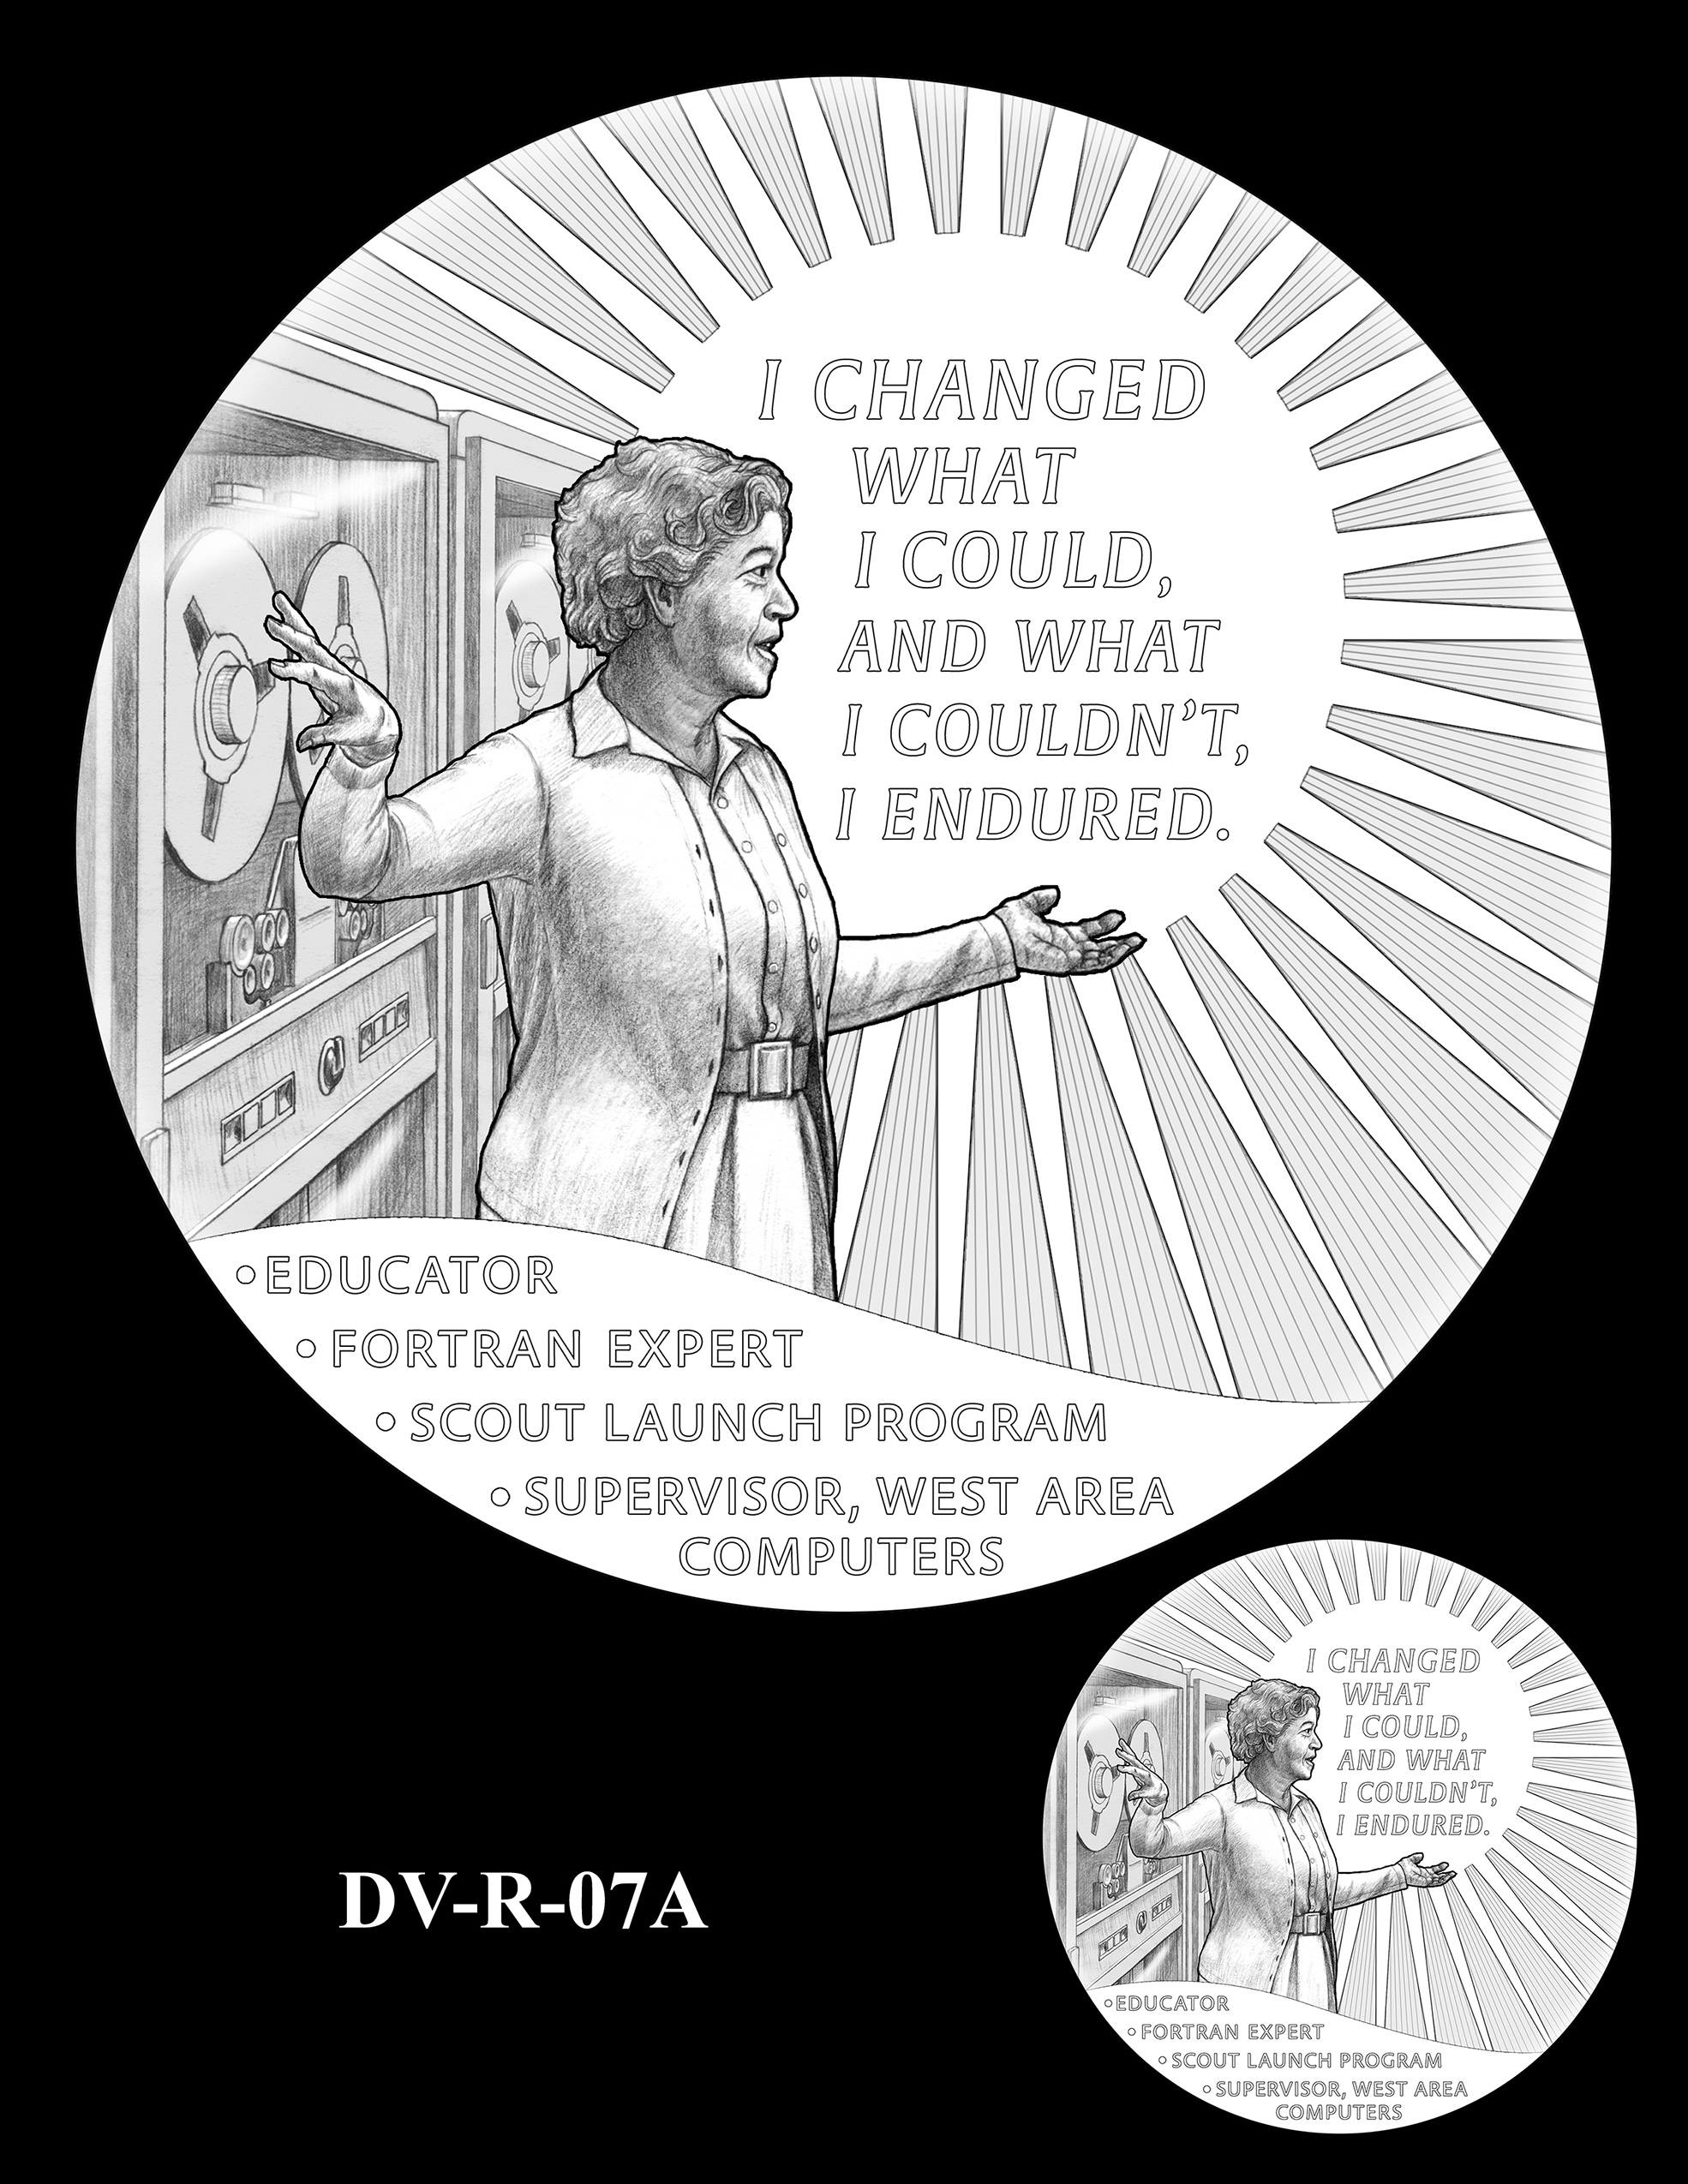 DV-R-07A -- Dorothy J. Vaughan Congressional Gold Medal